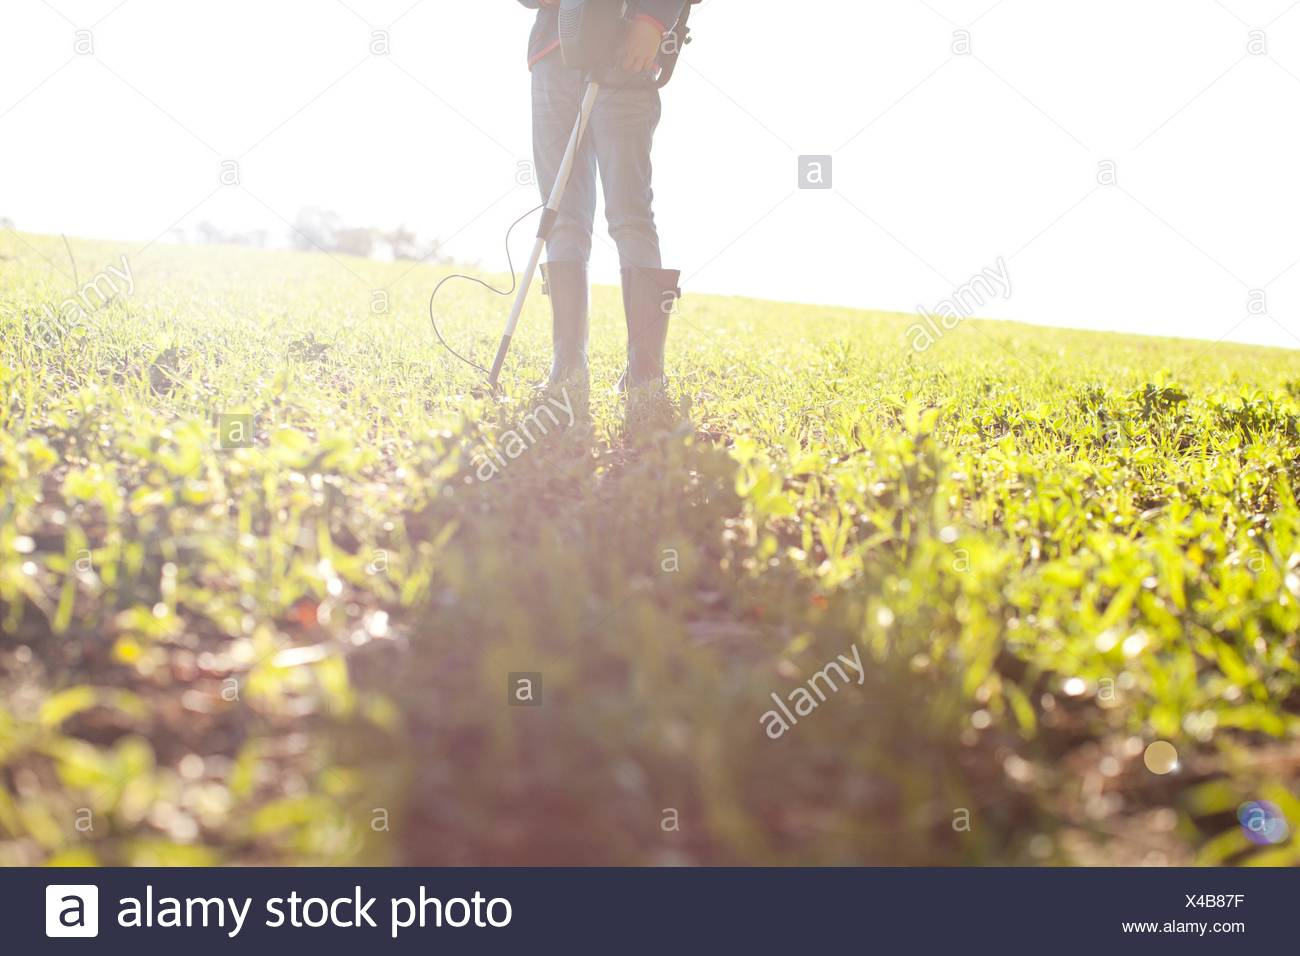 Legs of girl using metal detector in field - Stock Image